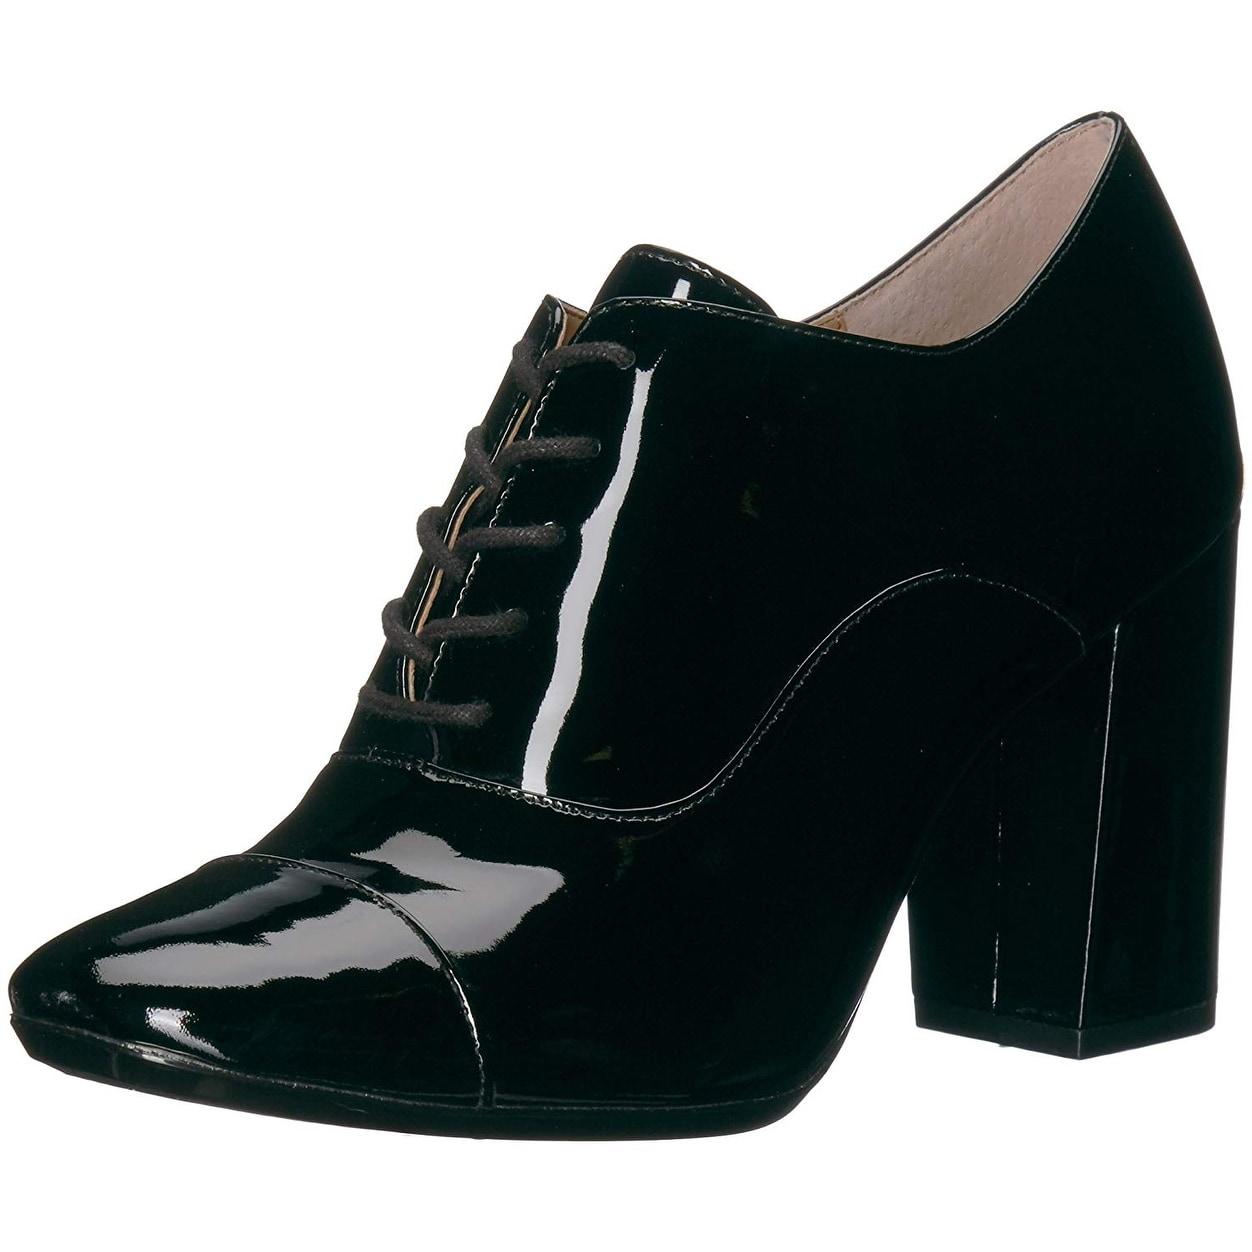 3d02ce12362eb Shop Calvin Klein Womens Cailey Ankle Boot Cap Toe Ankle Fashion ...